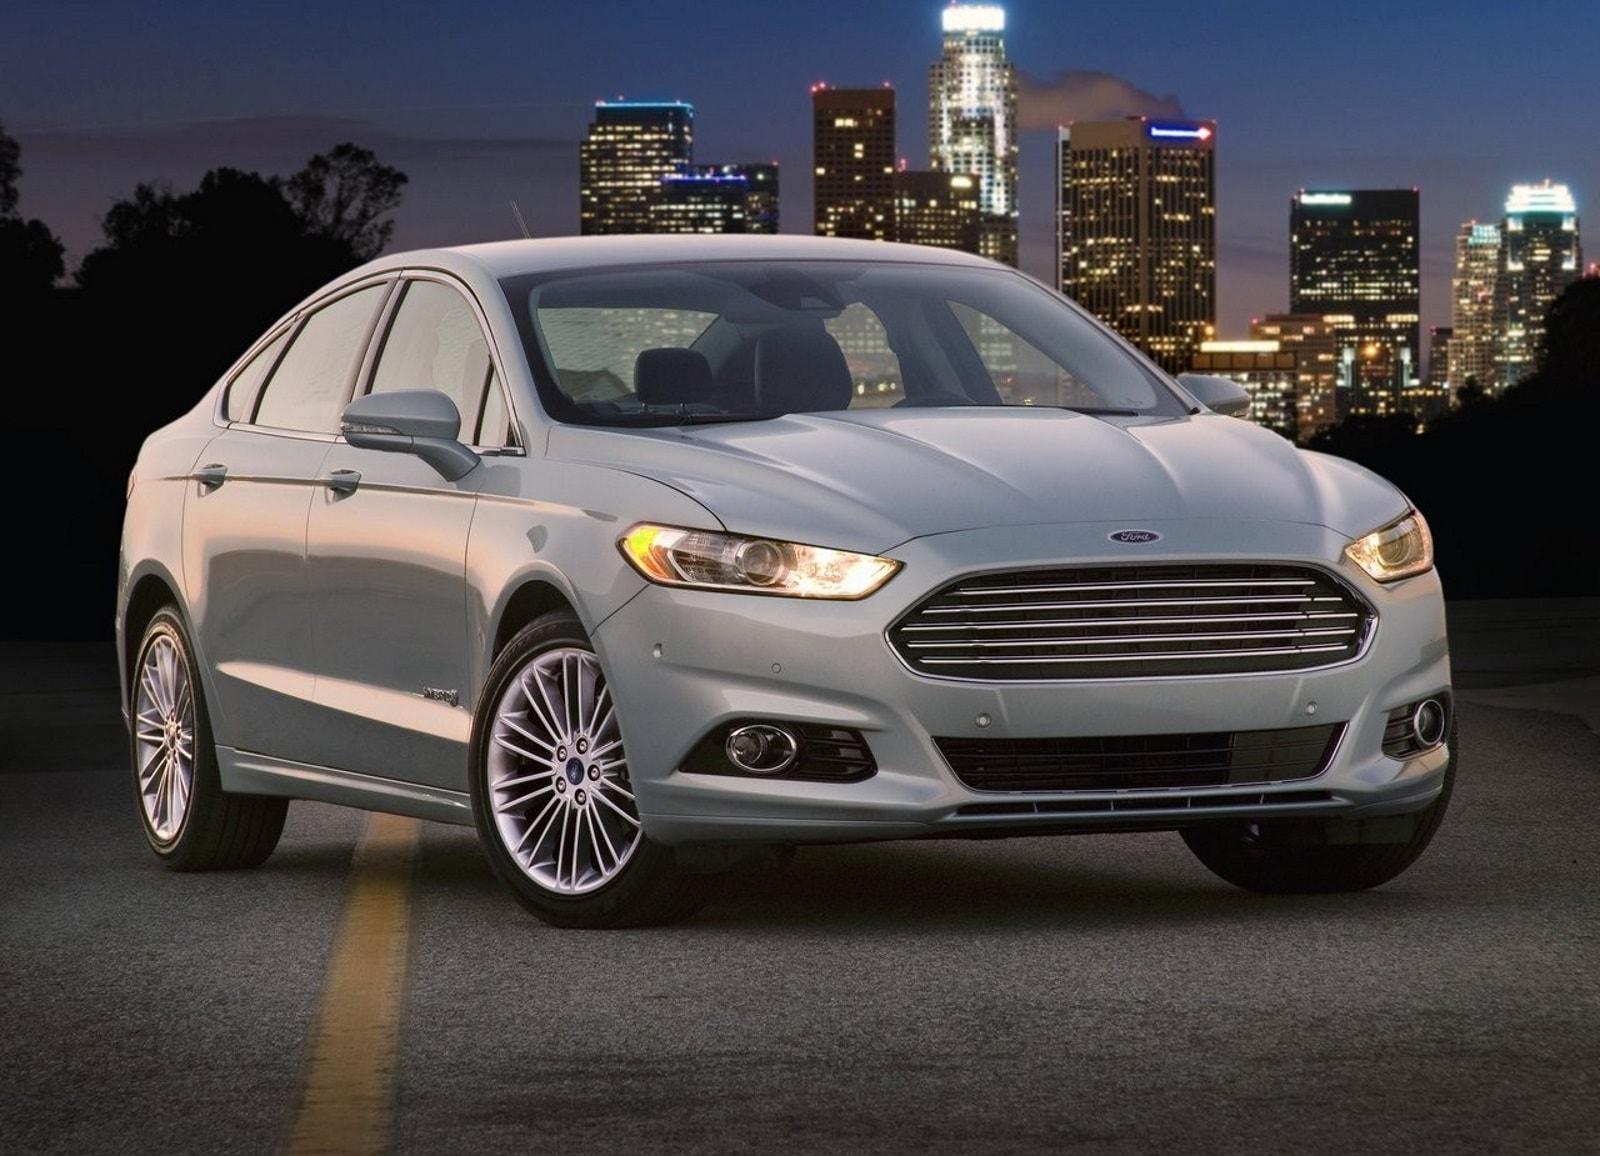 2013 Ford Fusion HD pics